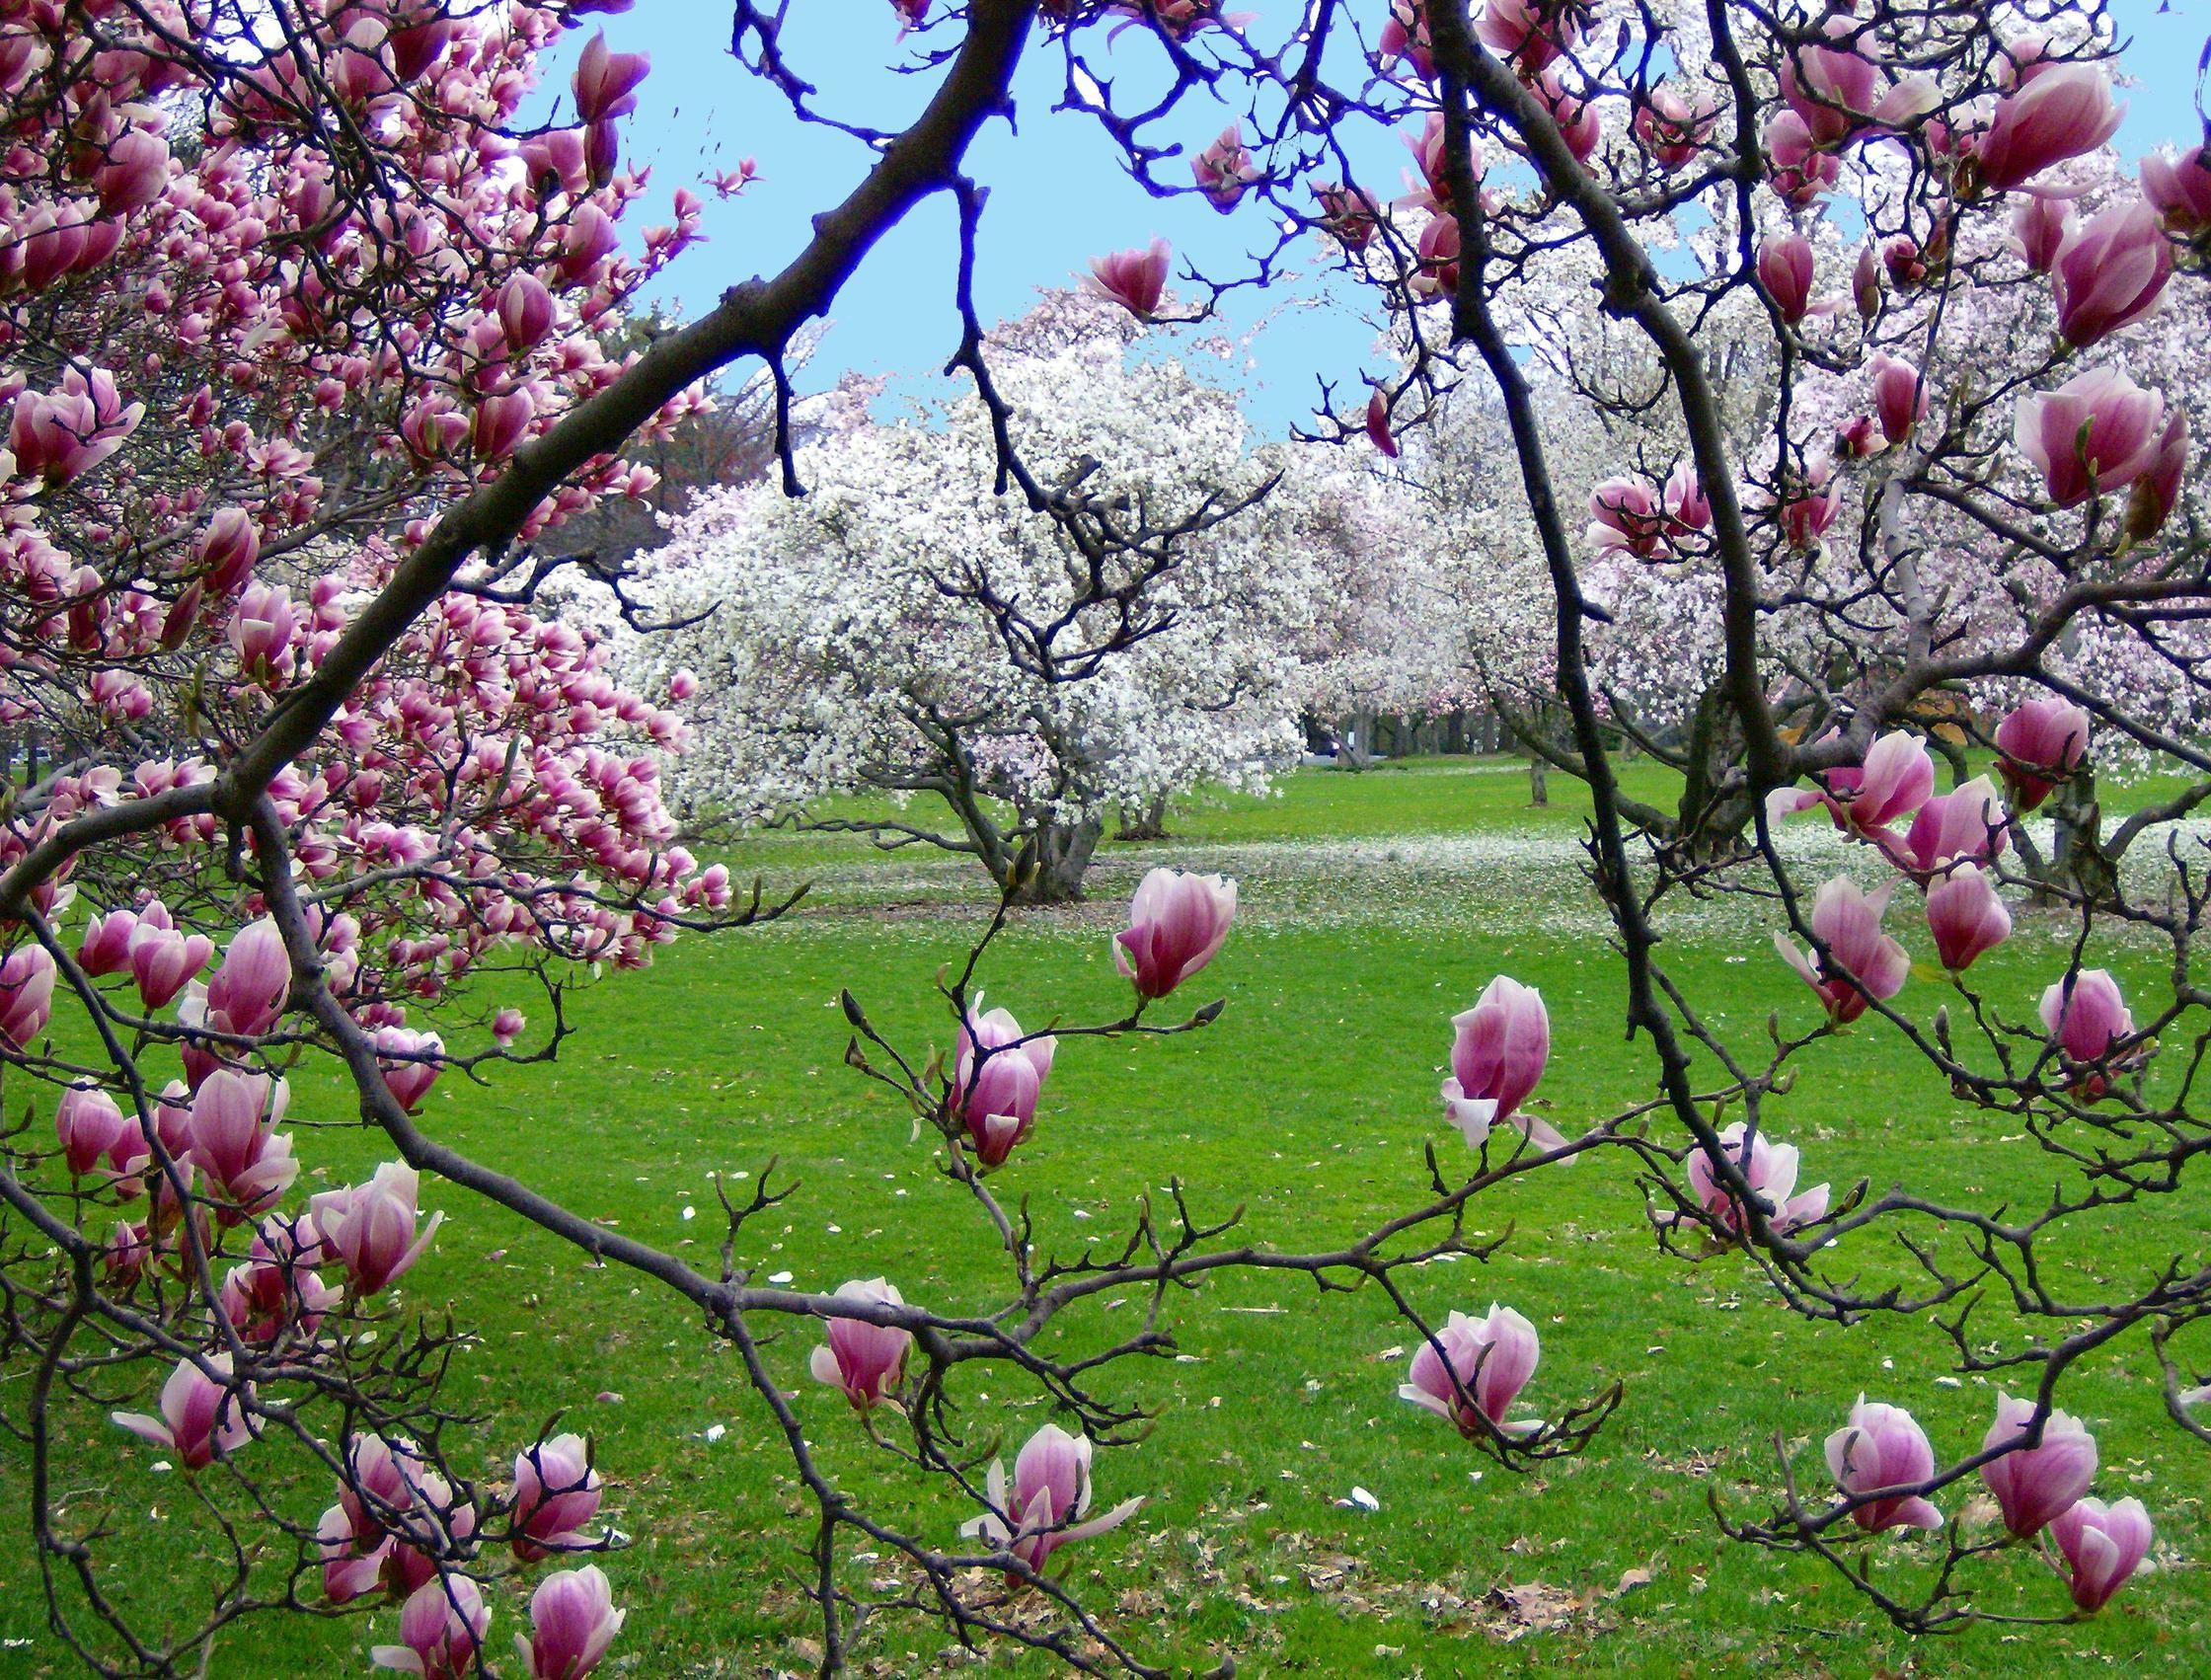 Spring scenes wallpaper wallpapertag - Backgrounds springtime ...